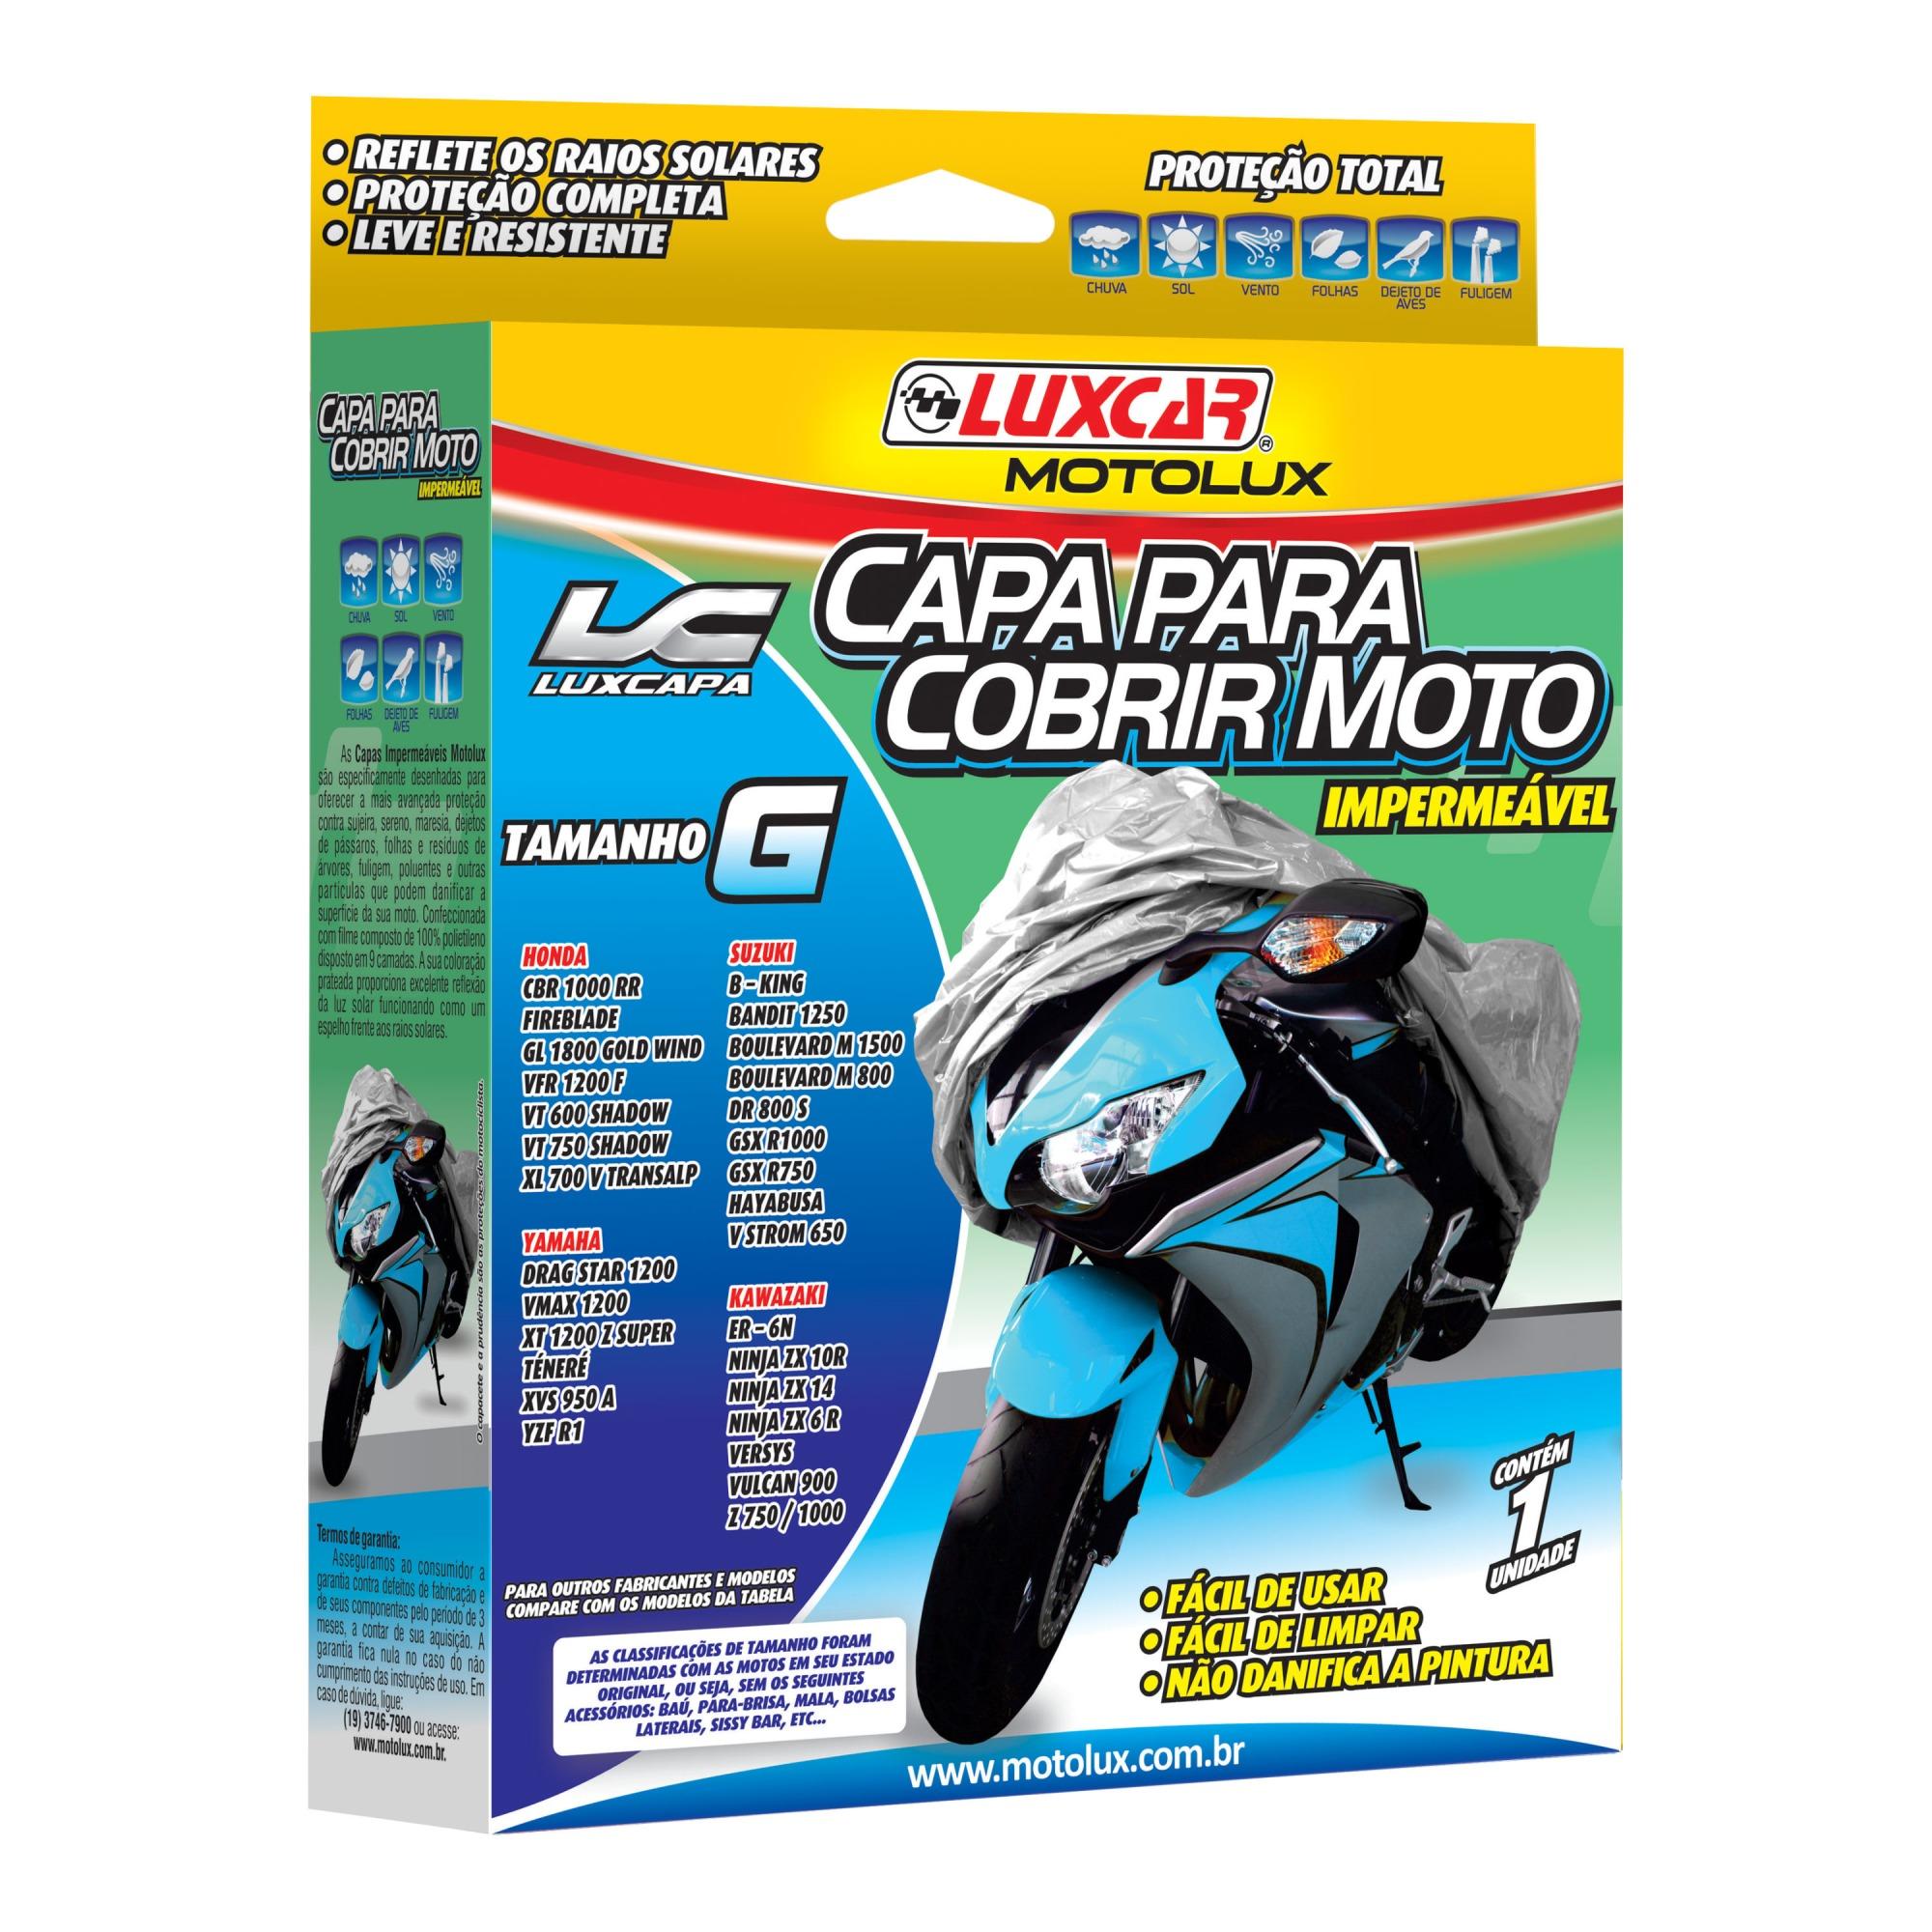 Capa Protetora para Moto Tamanho G 120 x 170m - Luxcar